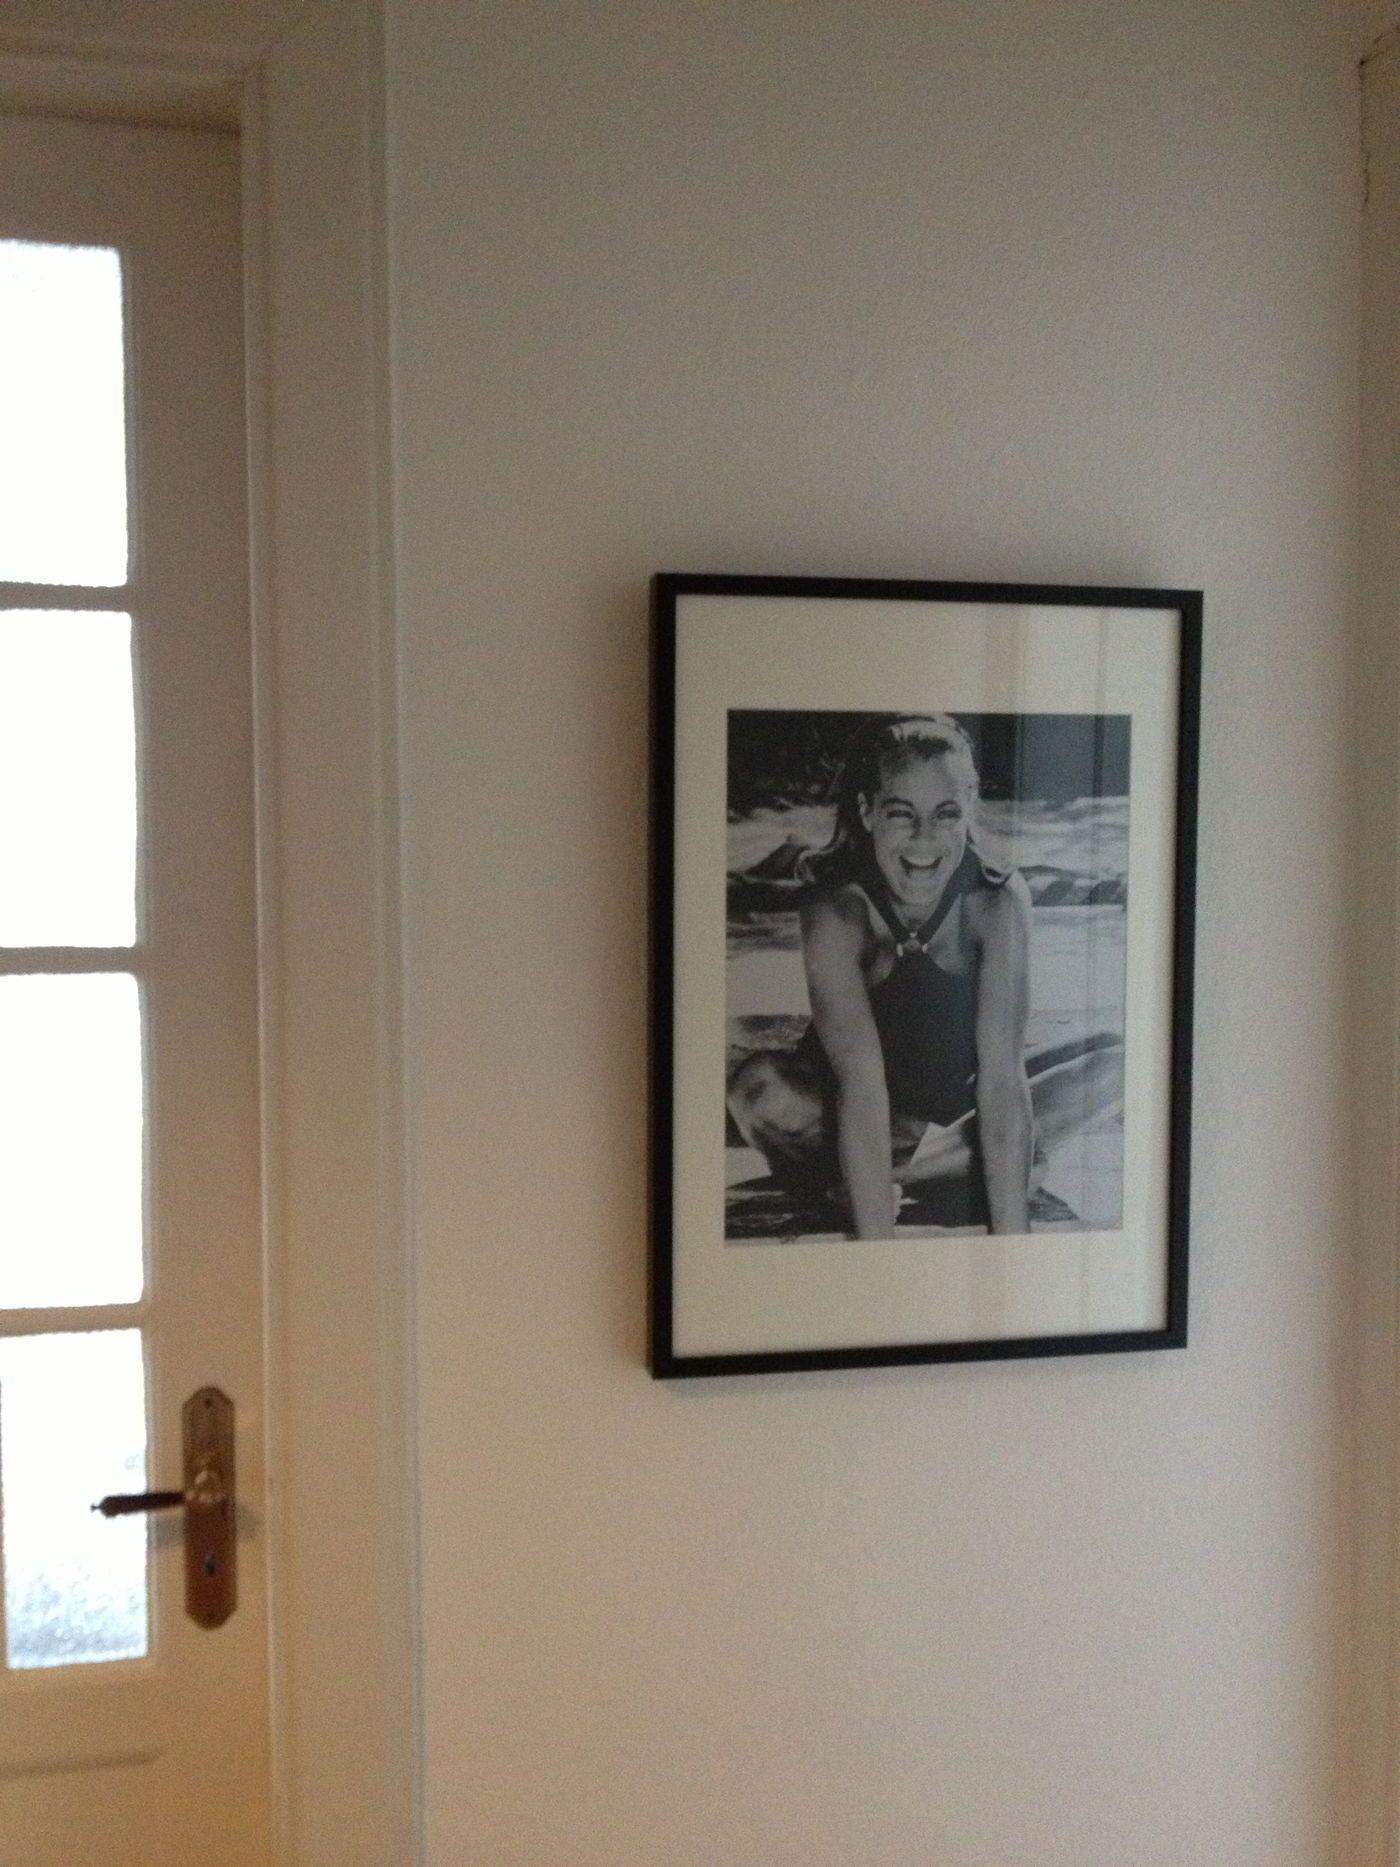 Impressive Flur Grau Collection Of In Schwarz-weiss-grau Ii